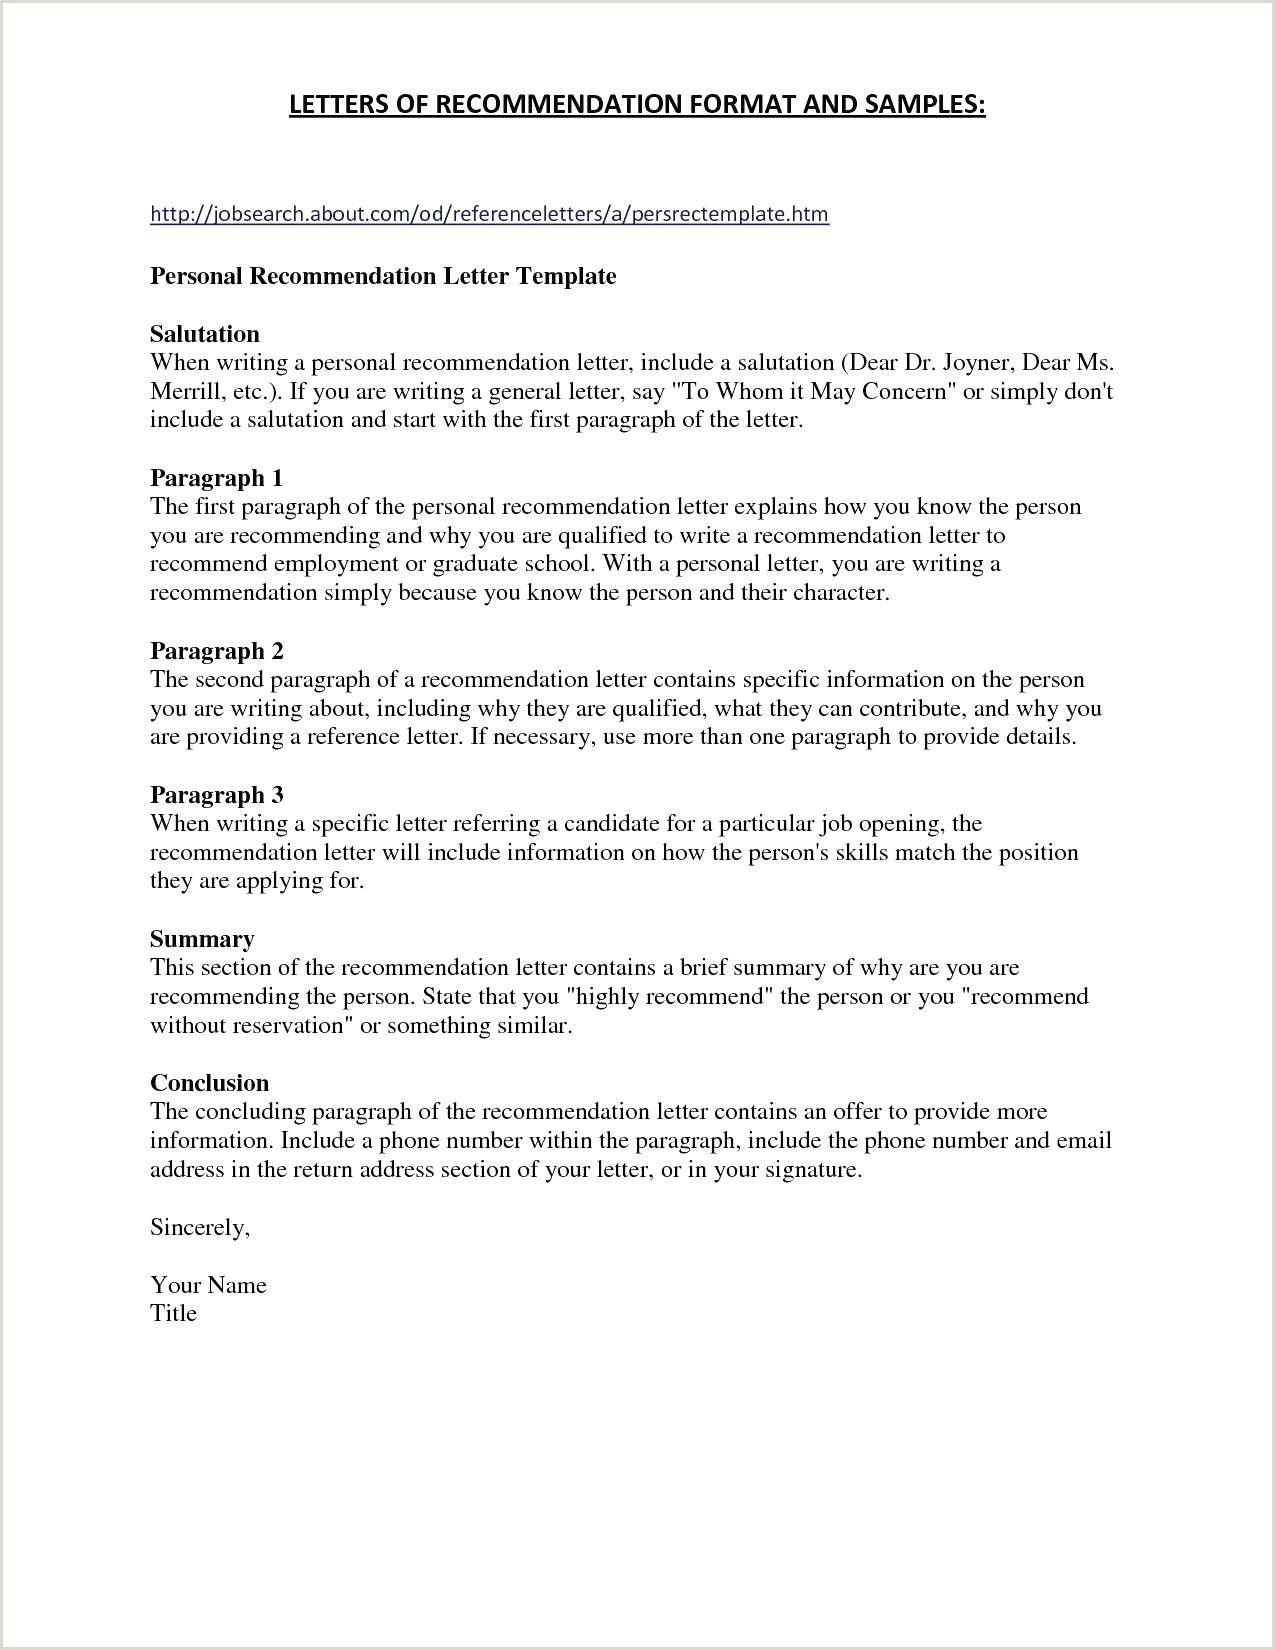 Cv format for Usa Jobs Resume Usa Jobs Resume Tips